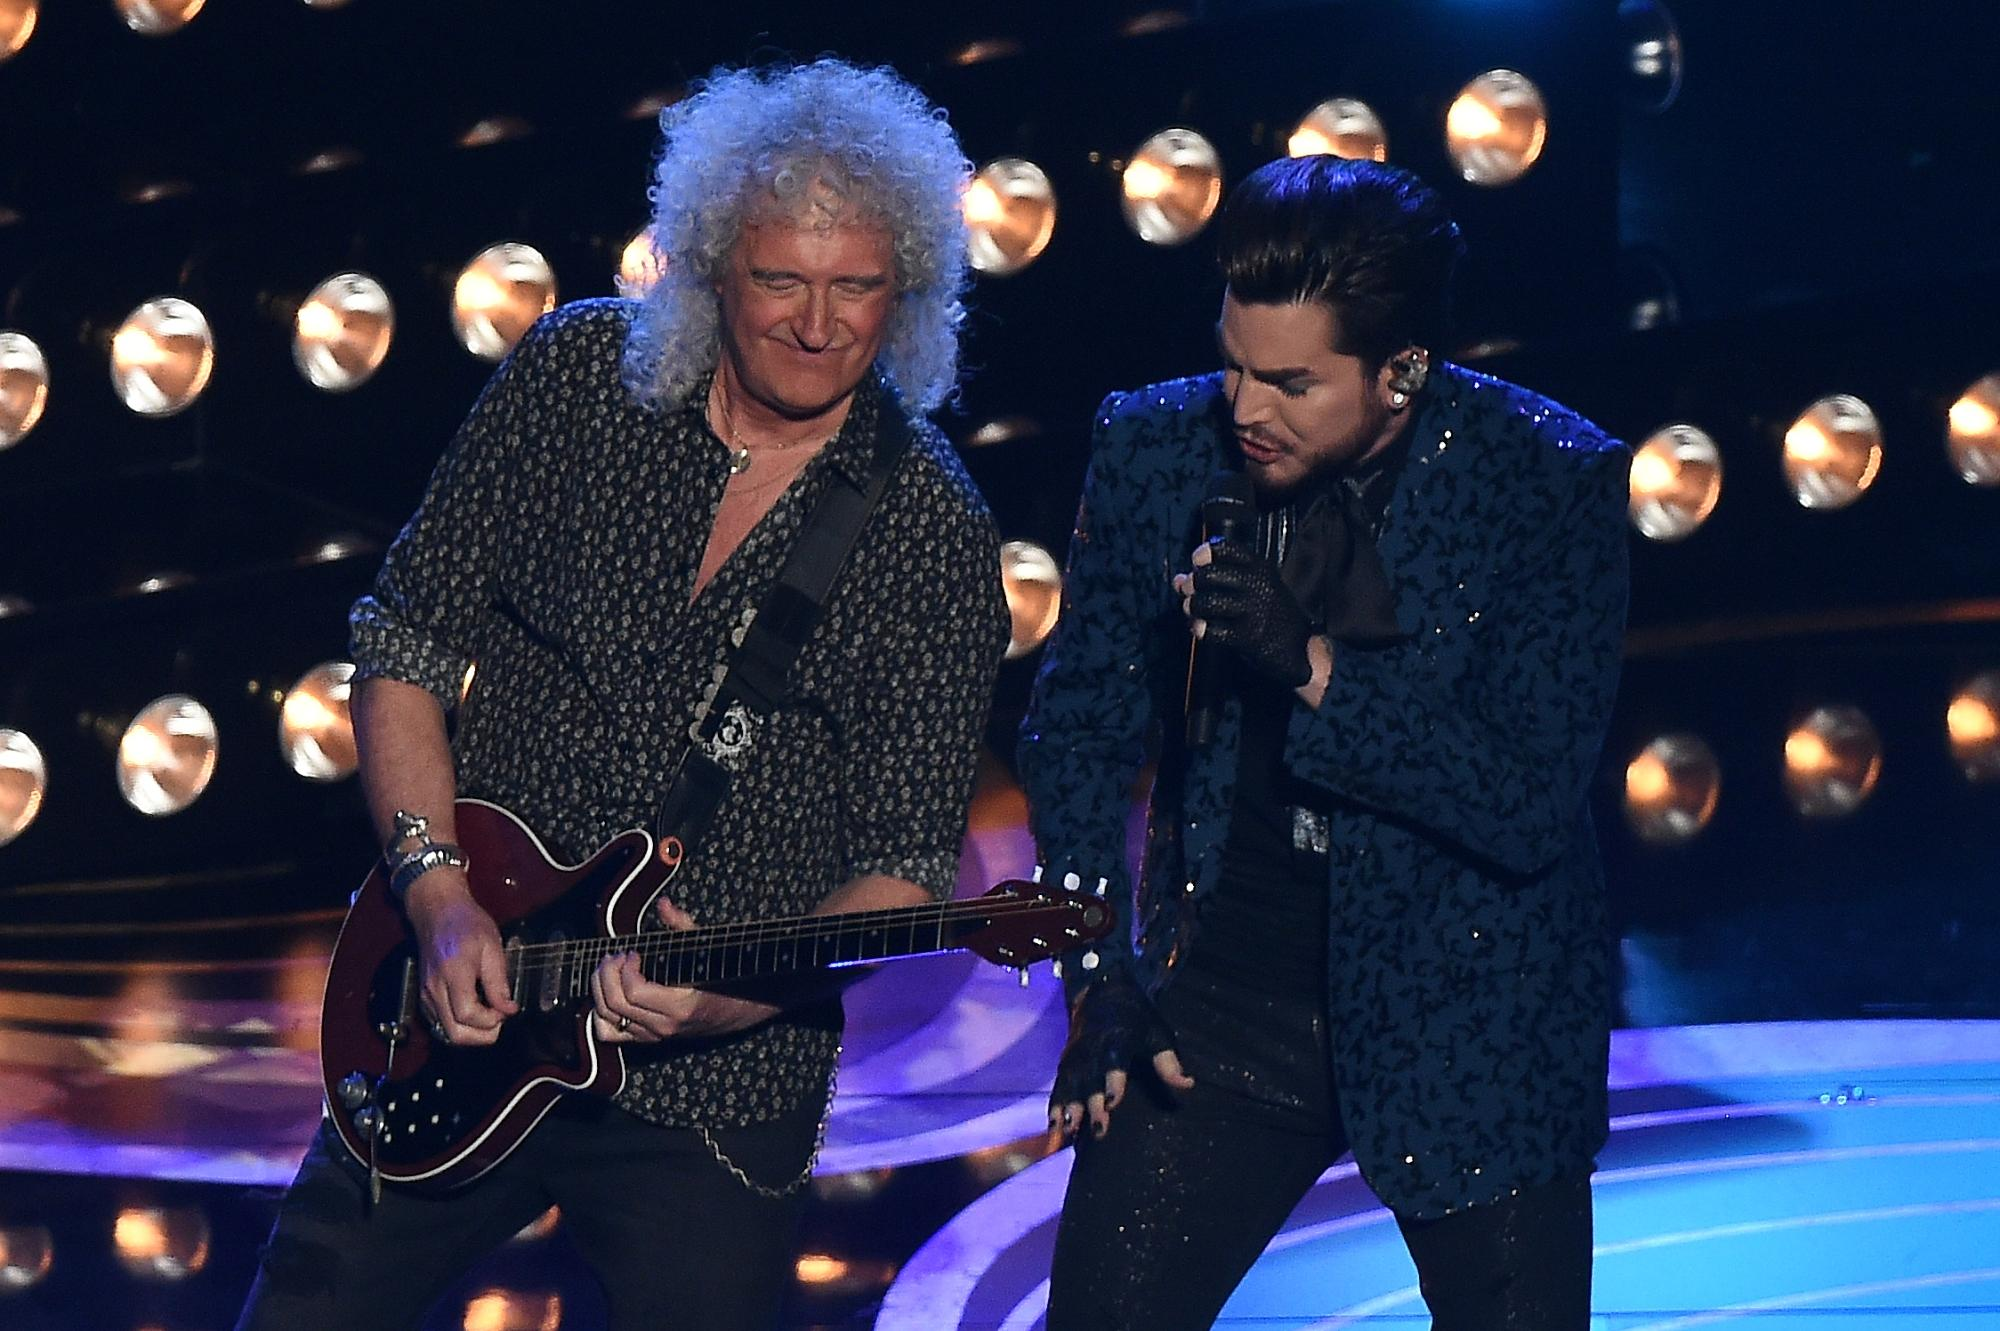 Oscar 2019, con i Queen un apertura nel segno del rock